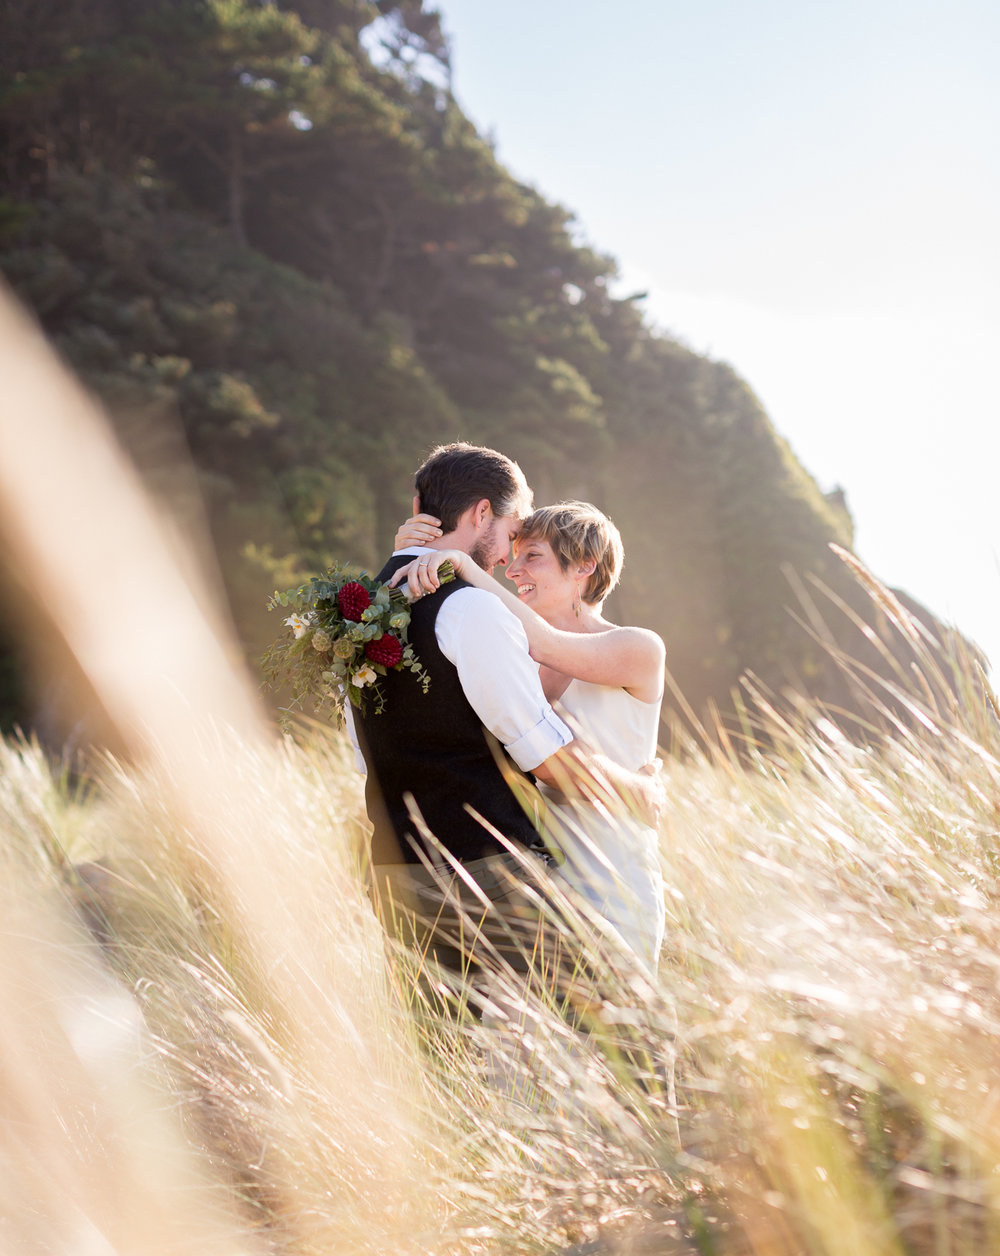 Destination-wedding-photographer-011.jpg